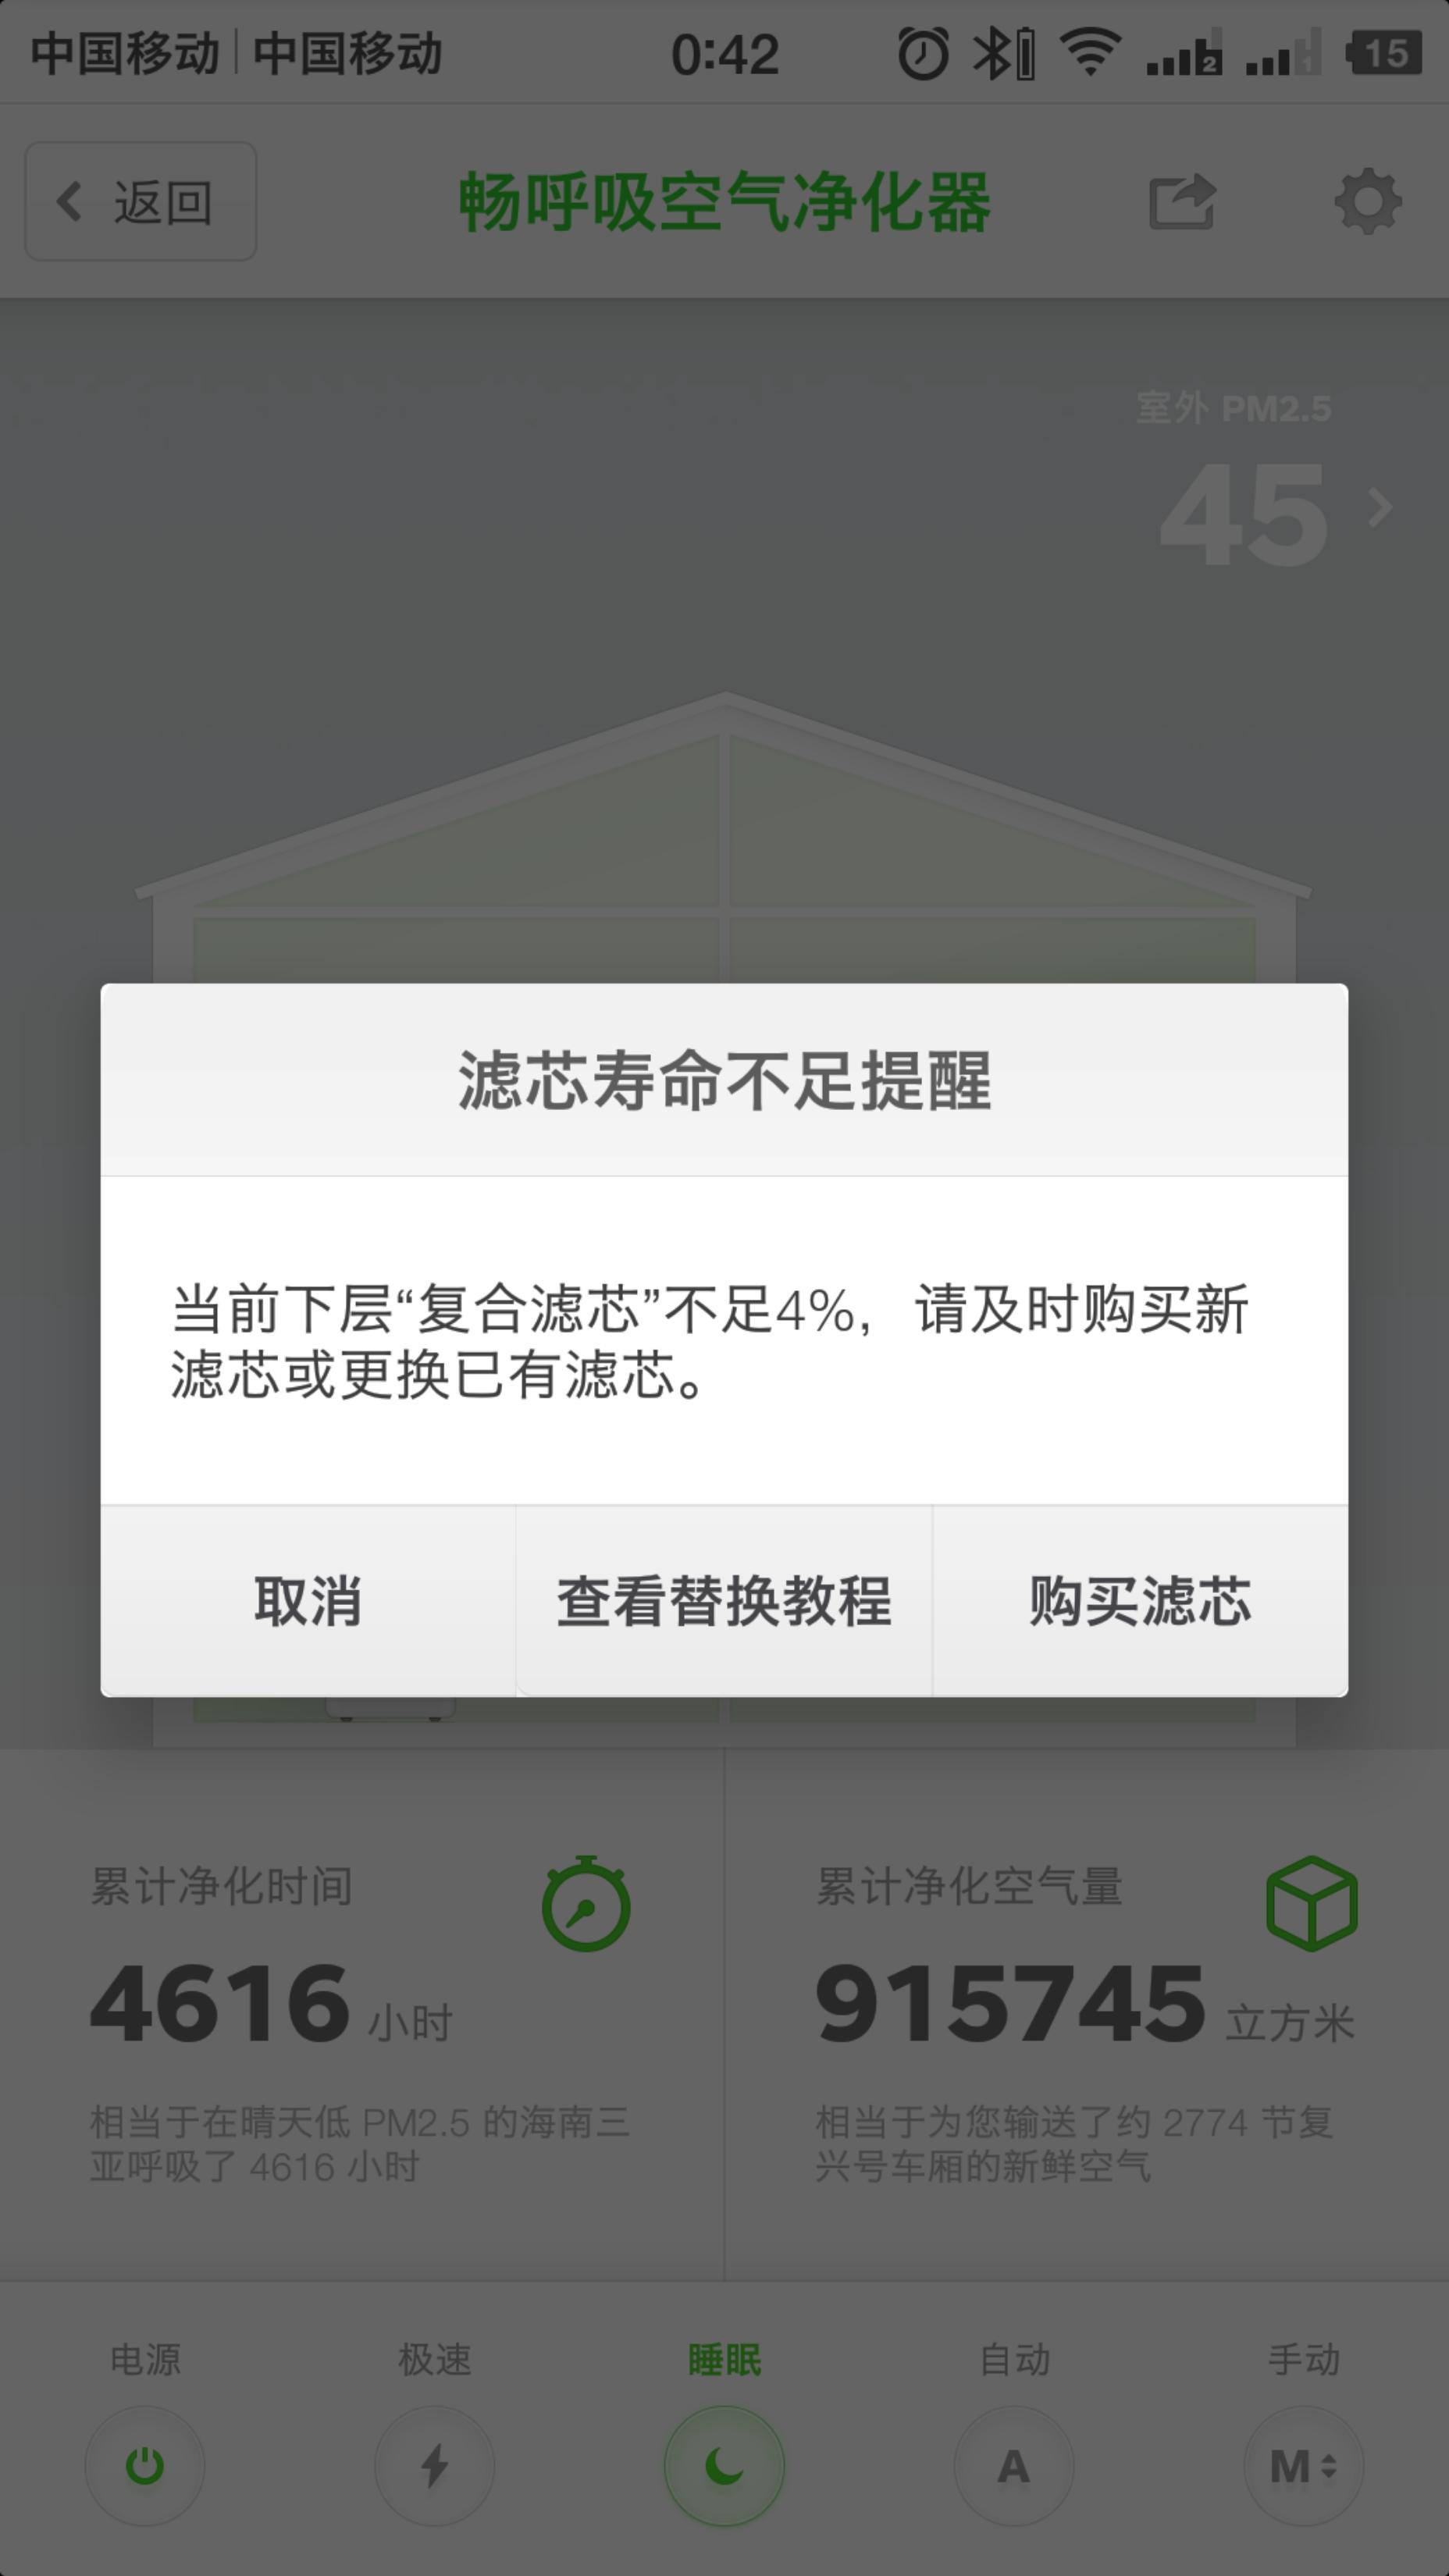 Screenshot_2018-05-24-00-42-23-060_???.png